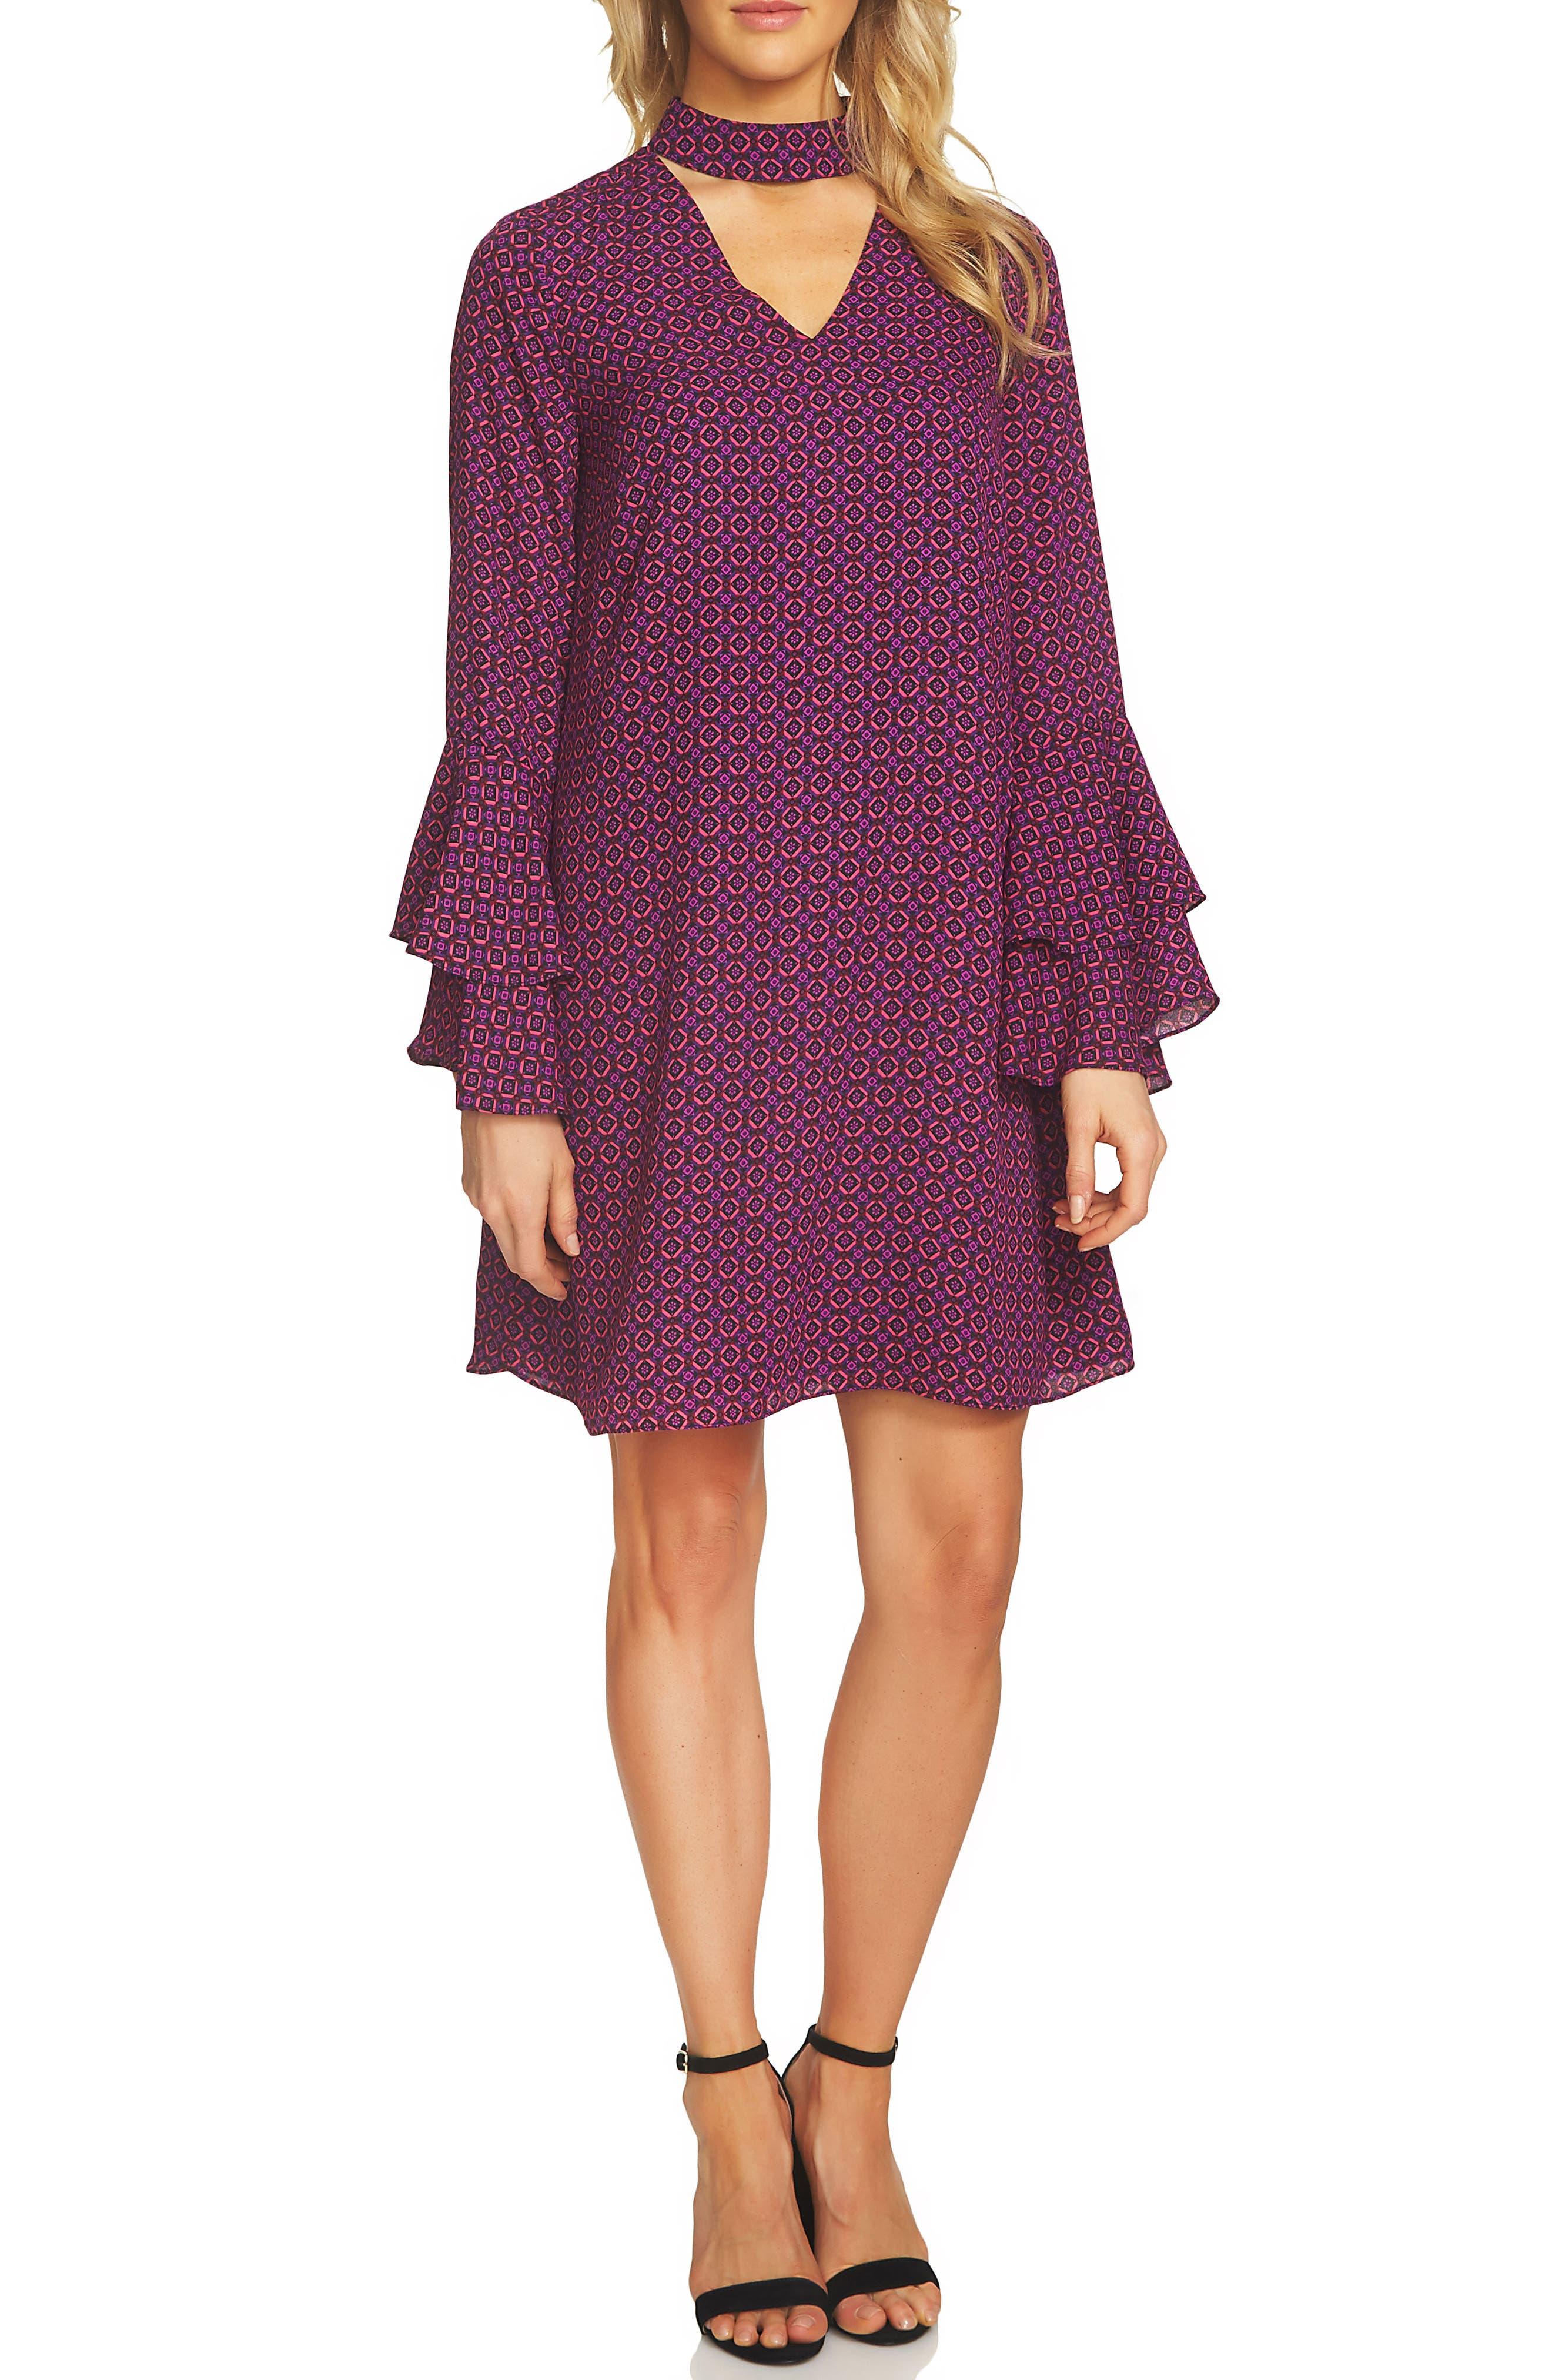 Alternate Image 1 Selected - CeCe Choker Bell Sleeve Dress